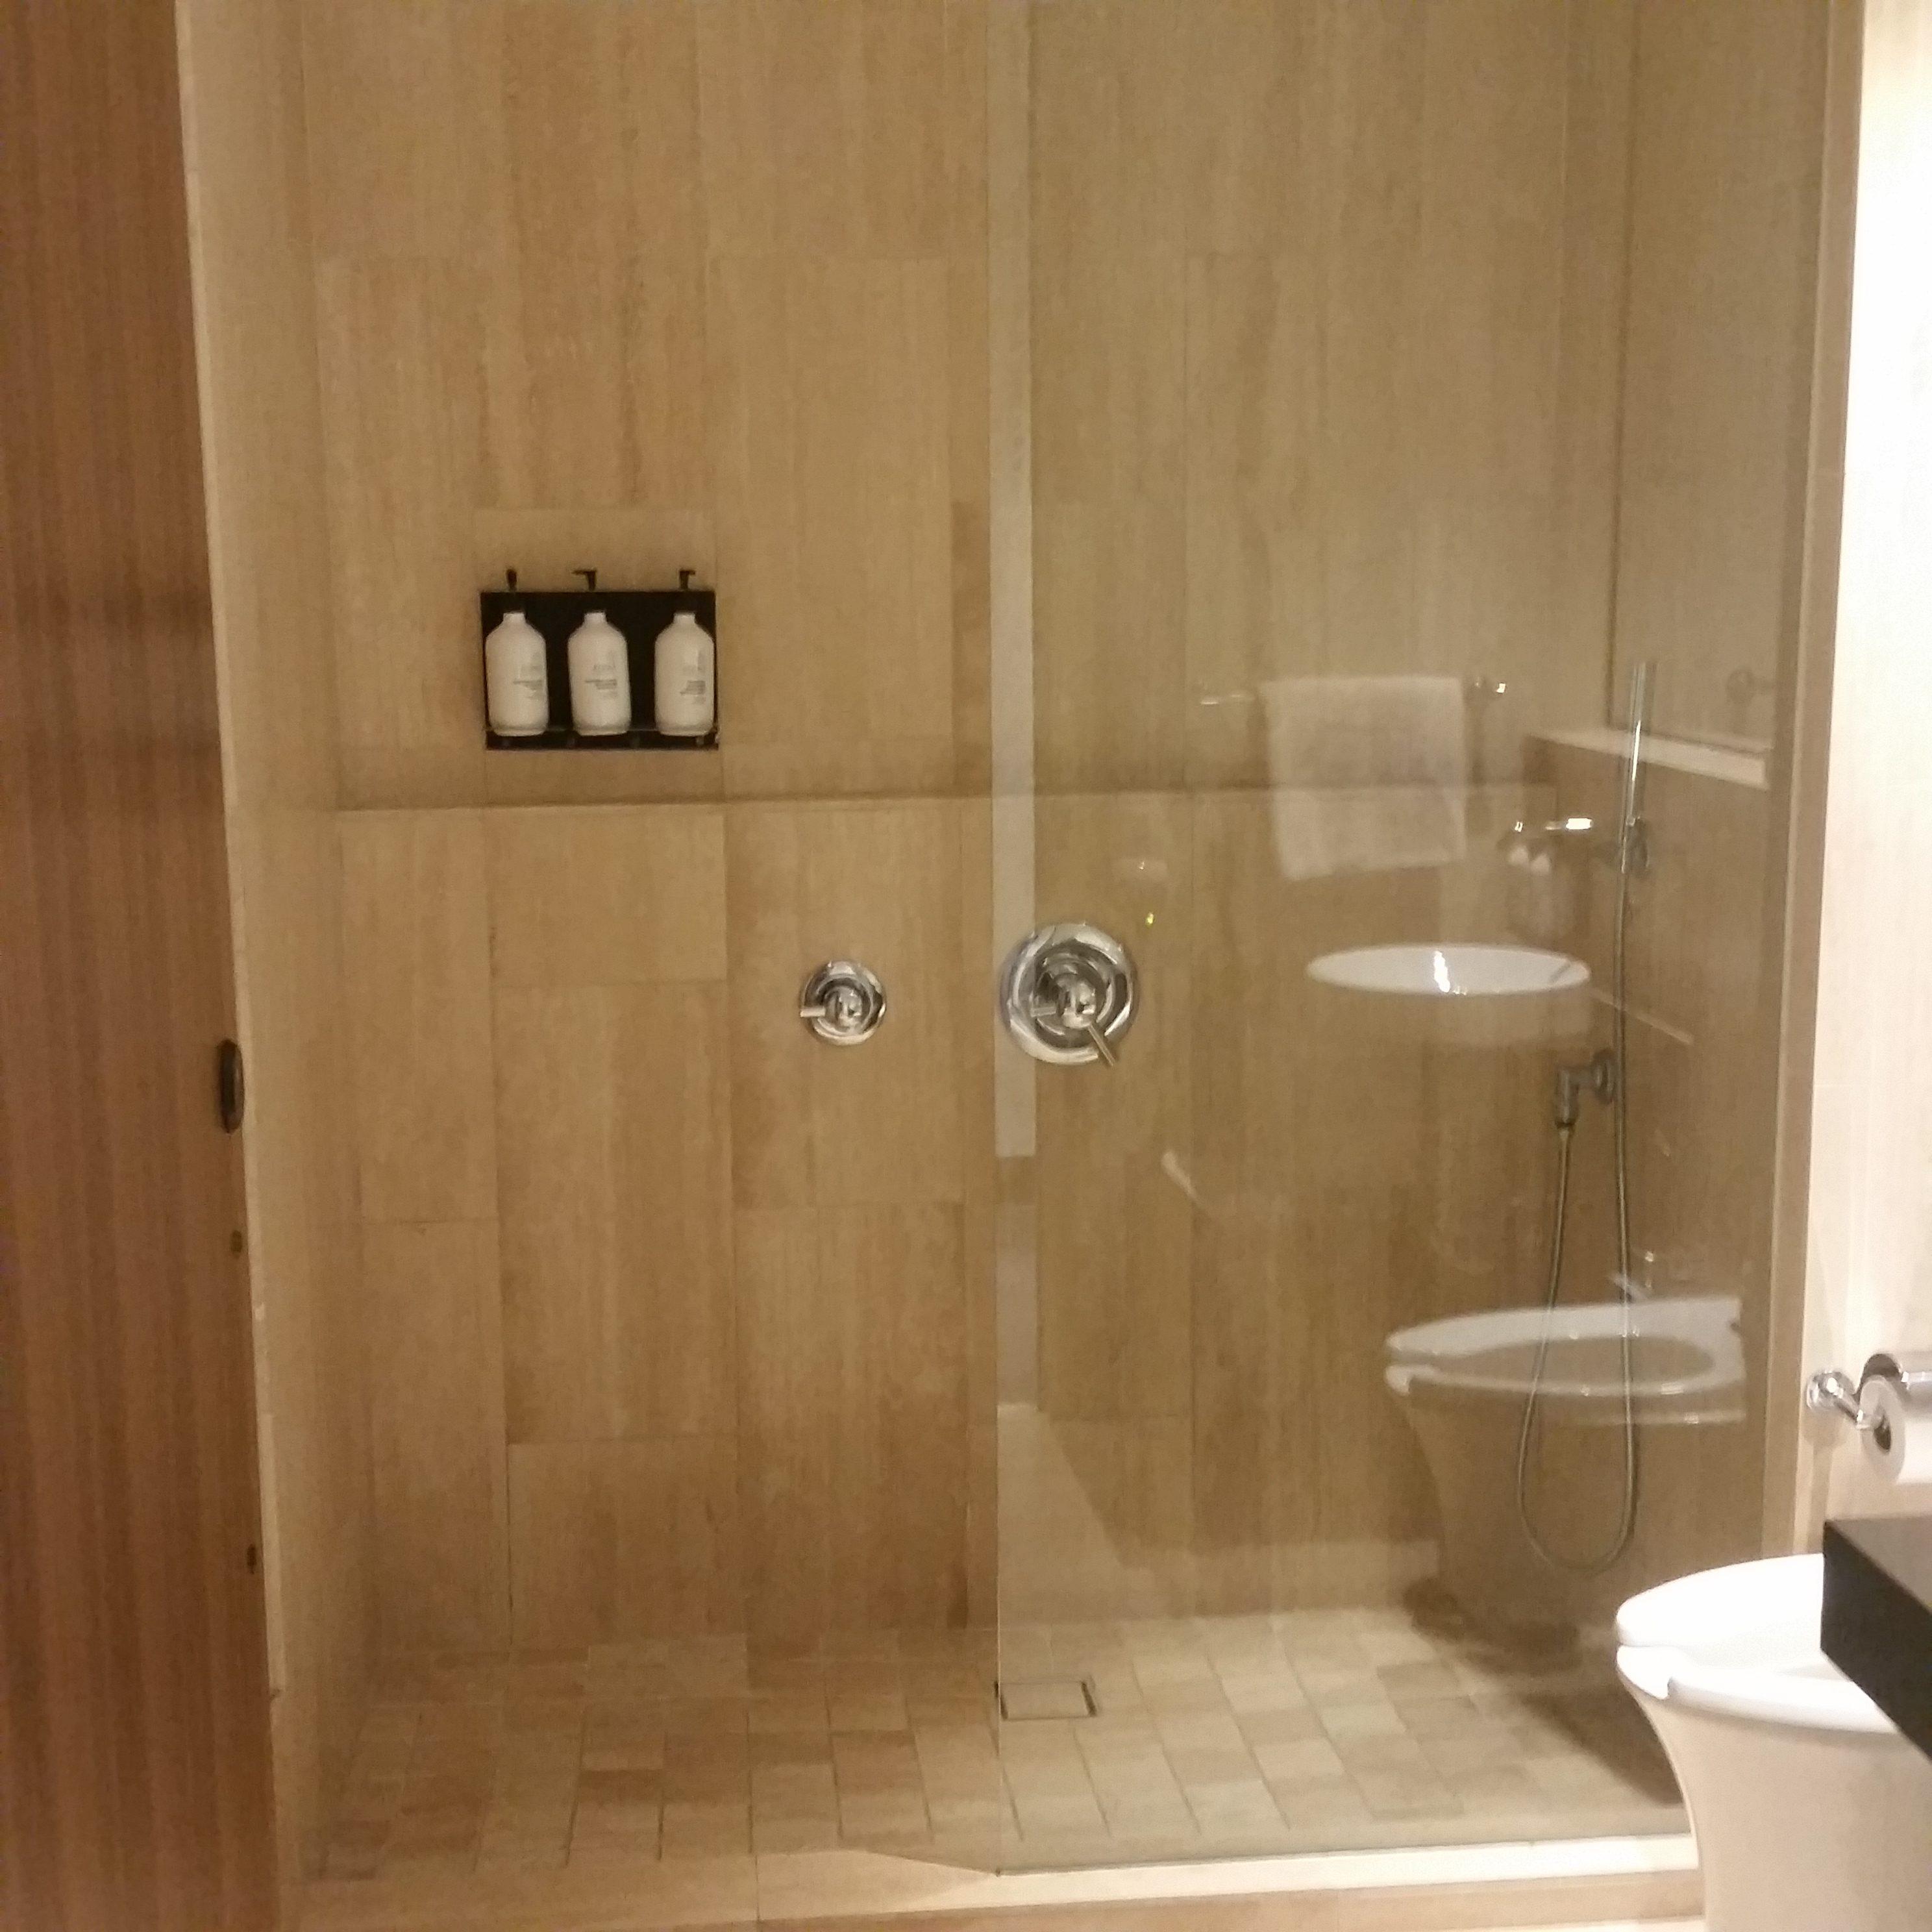 Qantas LAX lounge review shower